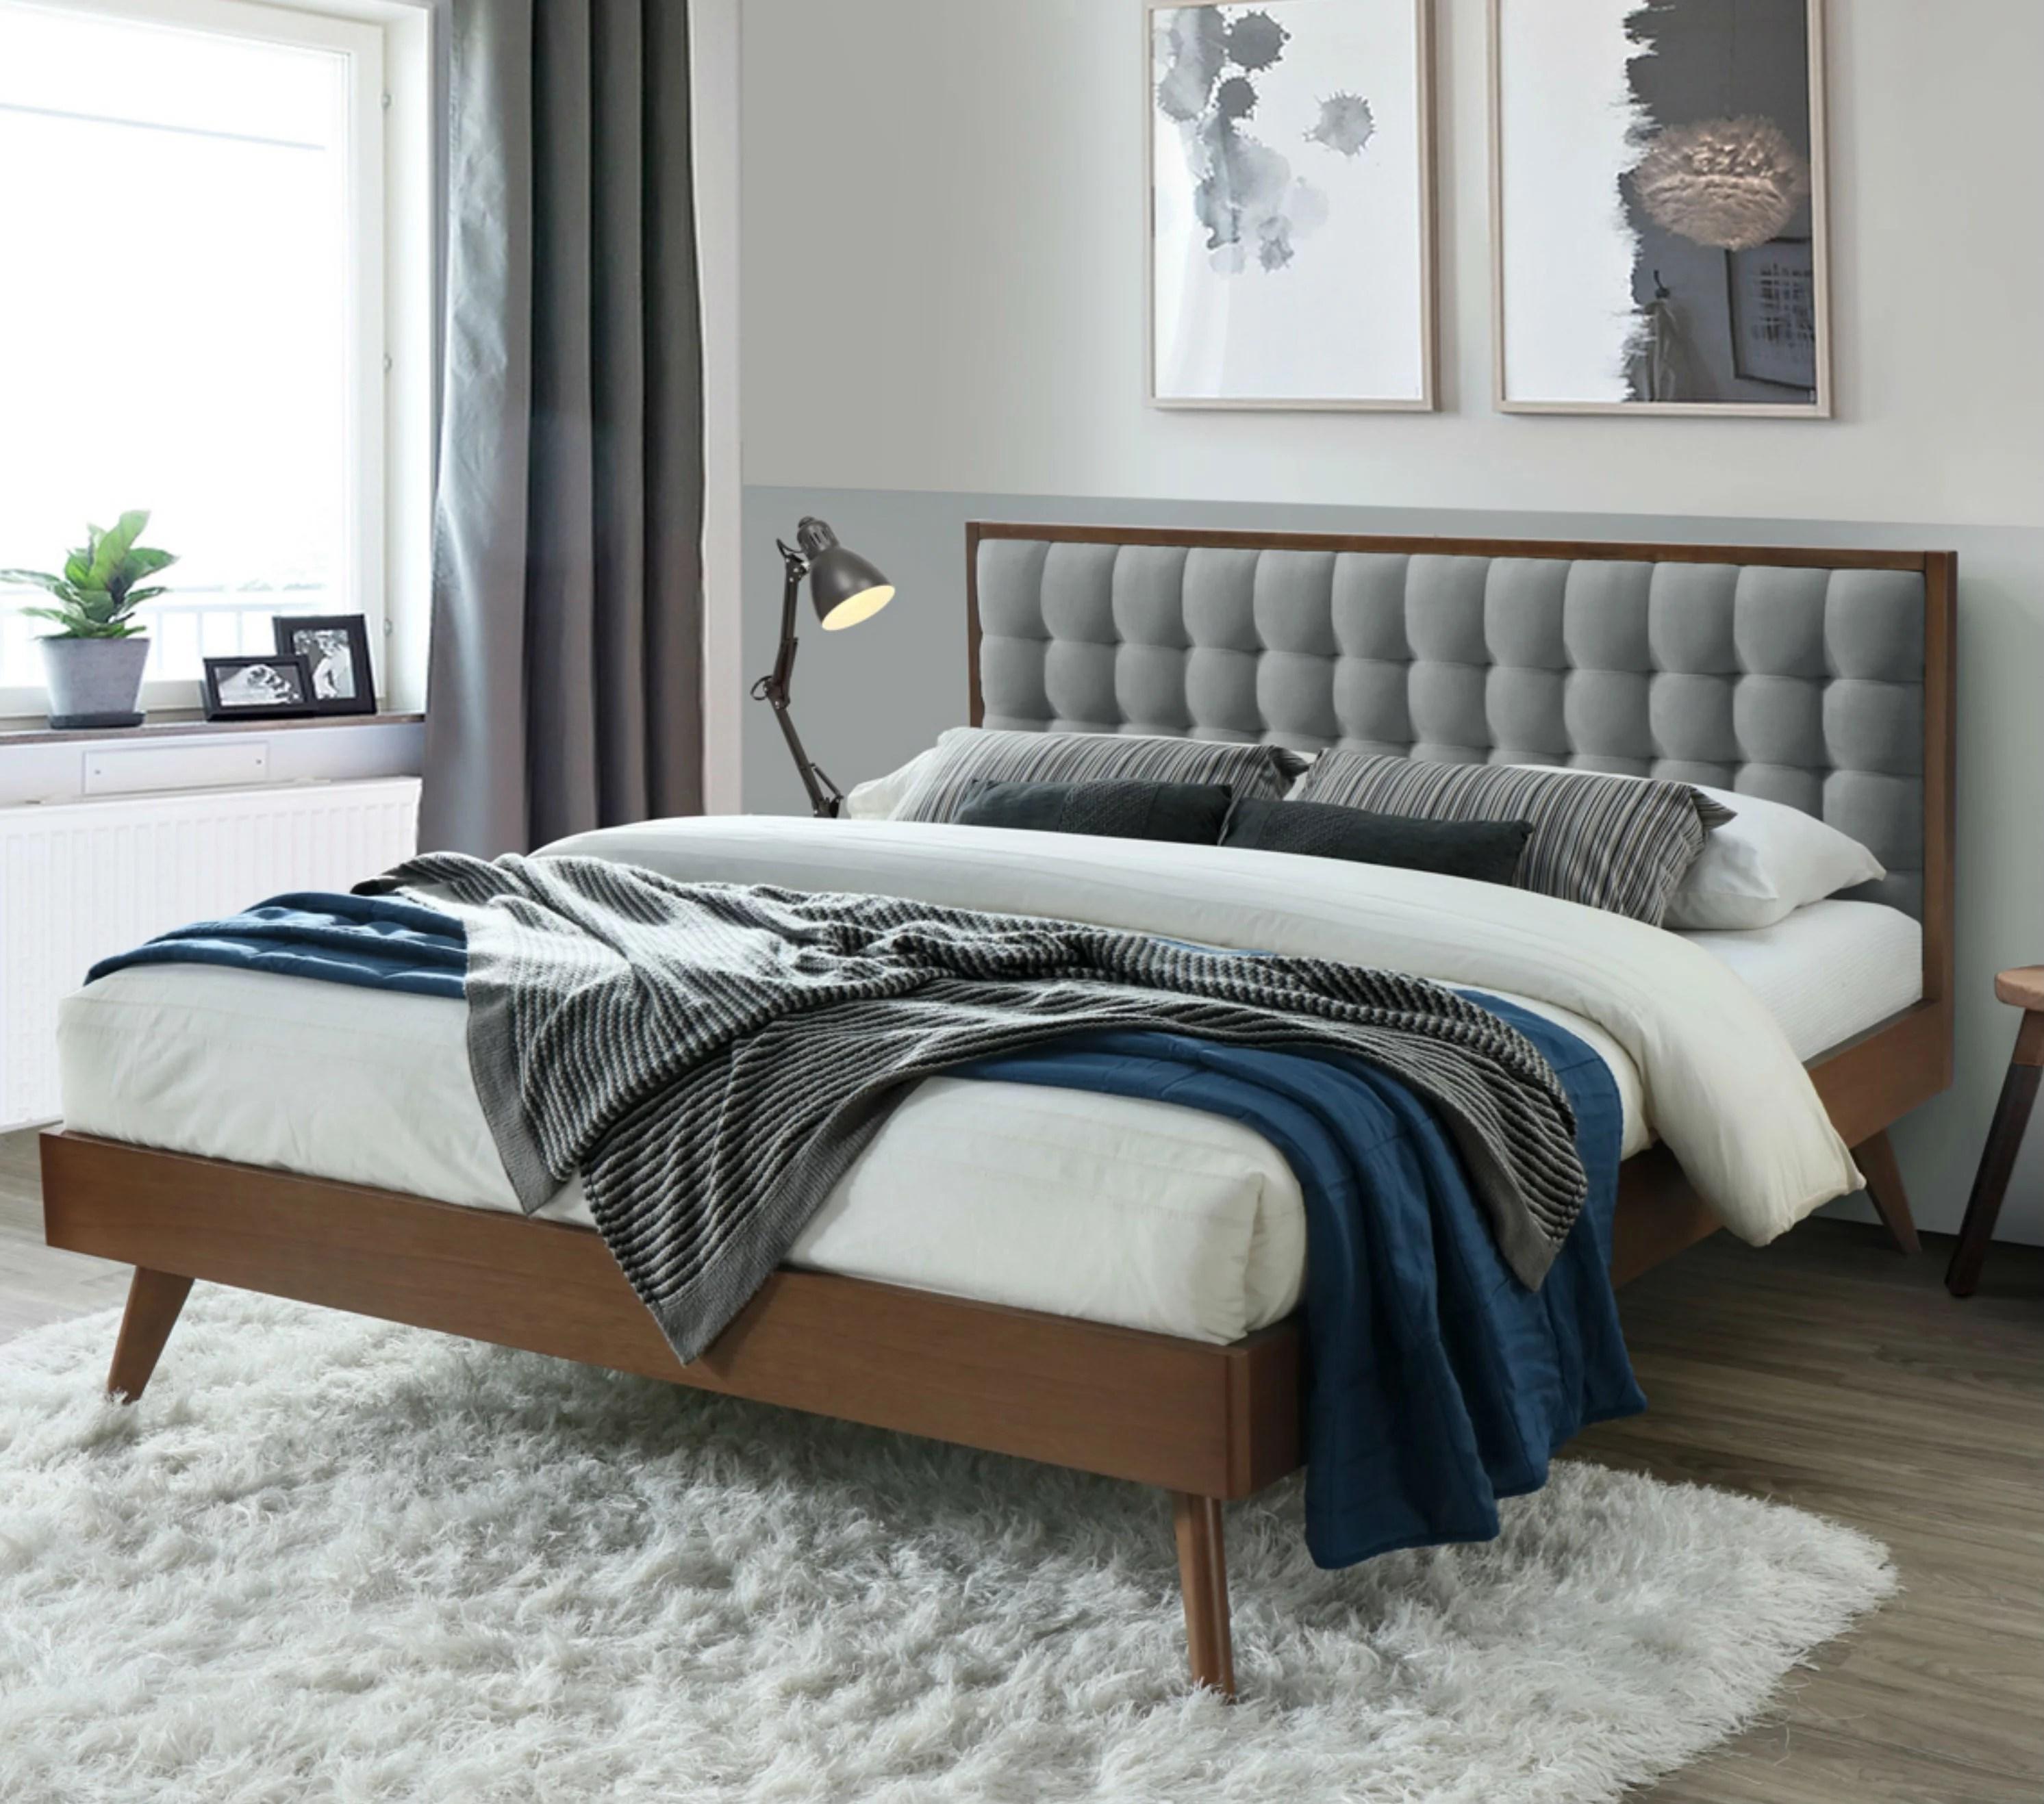 dg casa soloman mid century modern tufted upholstered platform bed frame king size in grey fabric